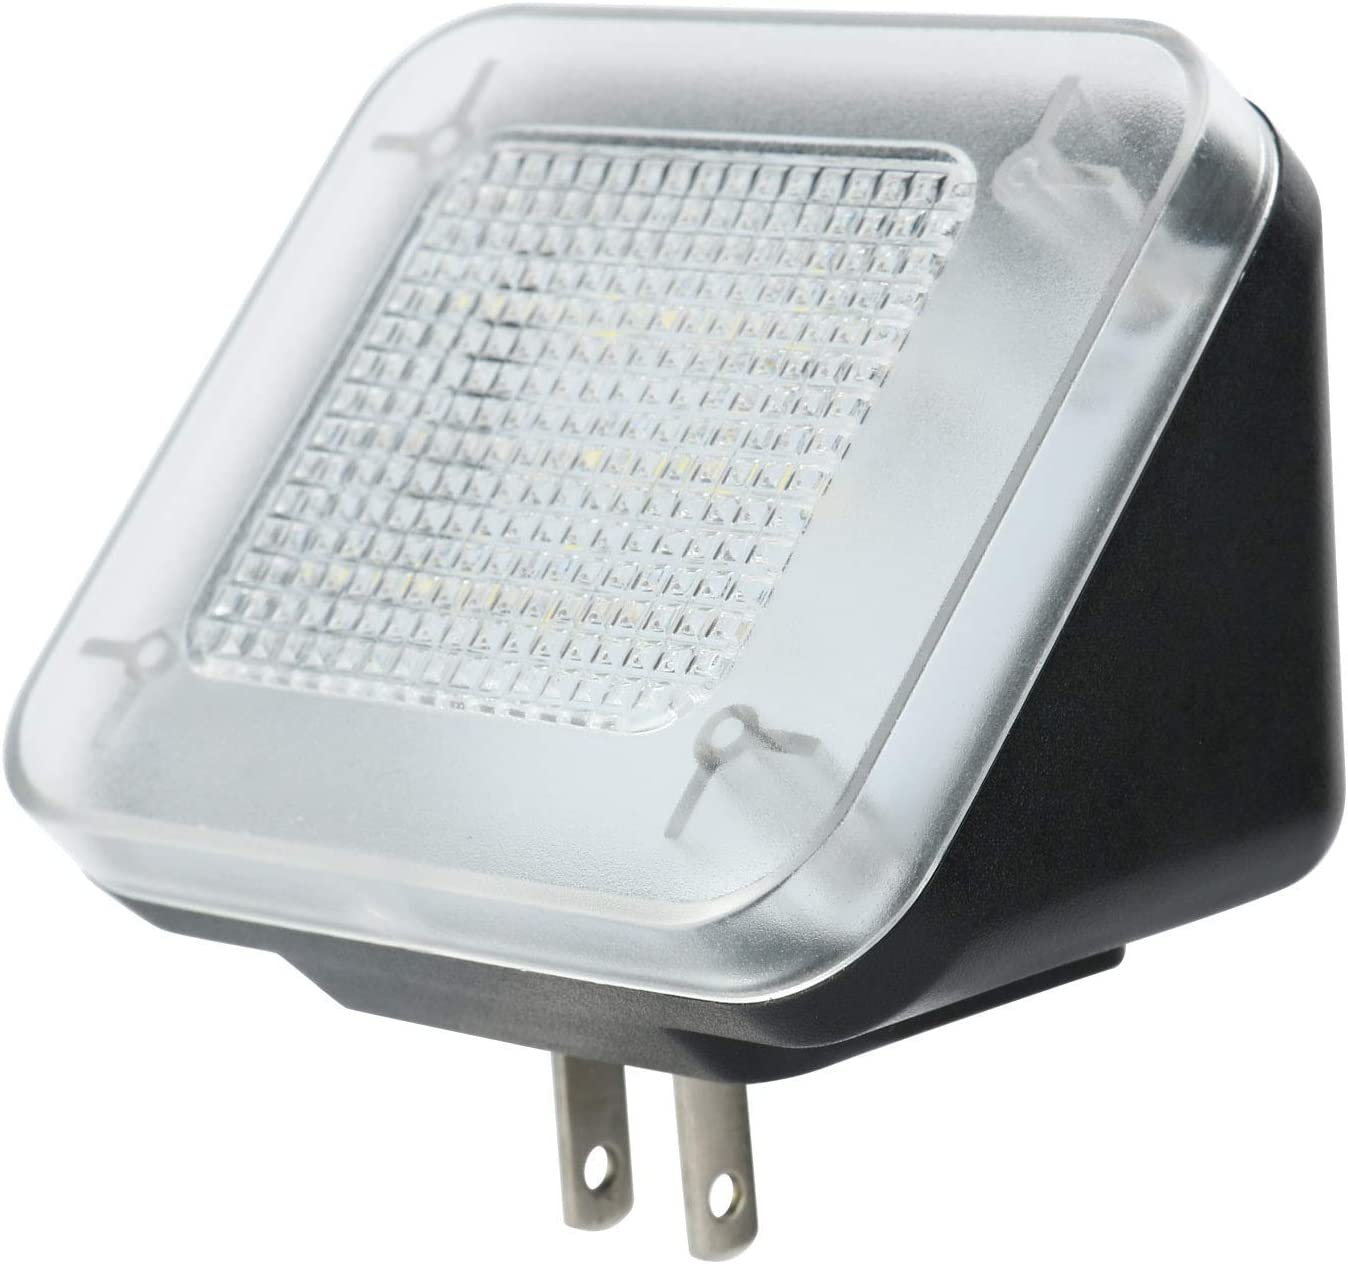 DealMux Home Security Light /— LED TV Program Simulator Dummy Burglar Thief Deterrent Crime Prevention Device Built-in Light Sensor Timer